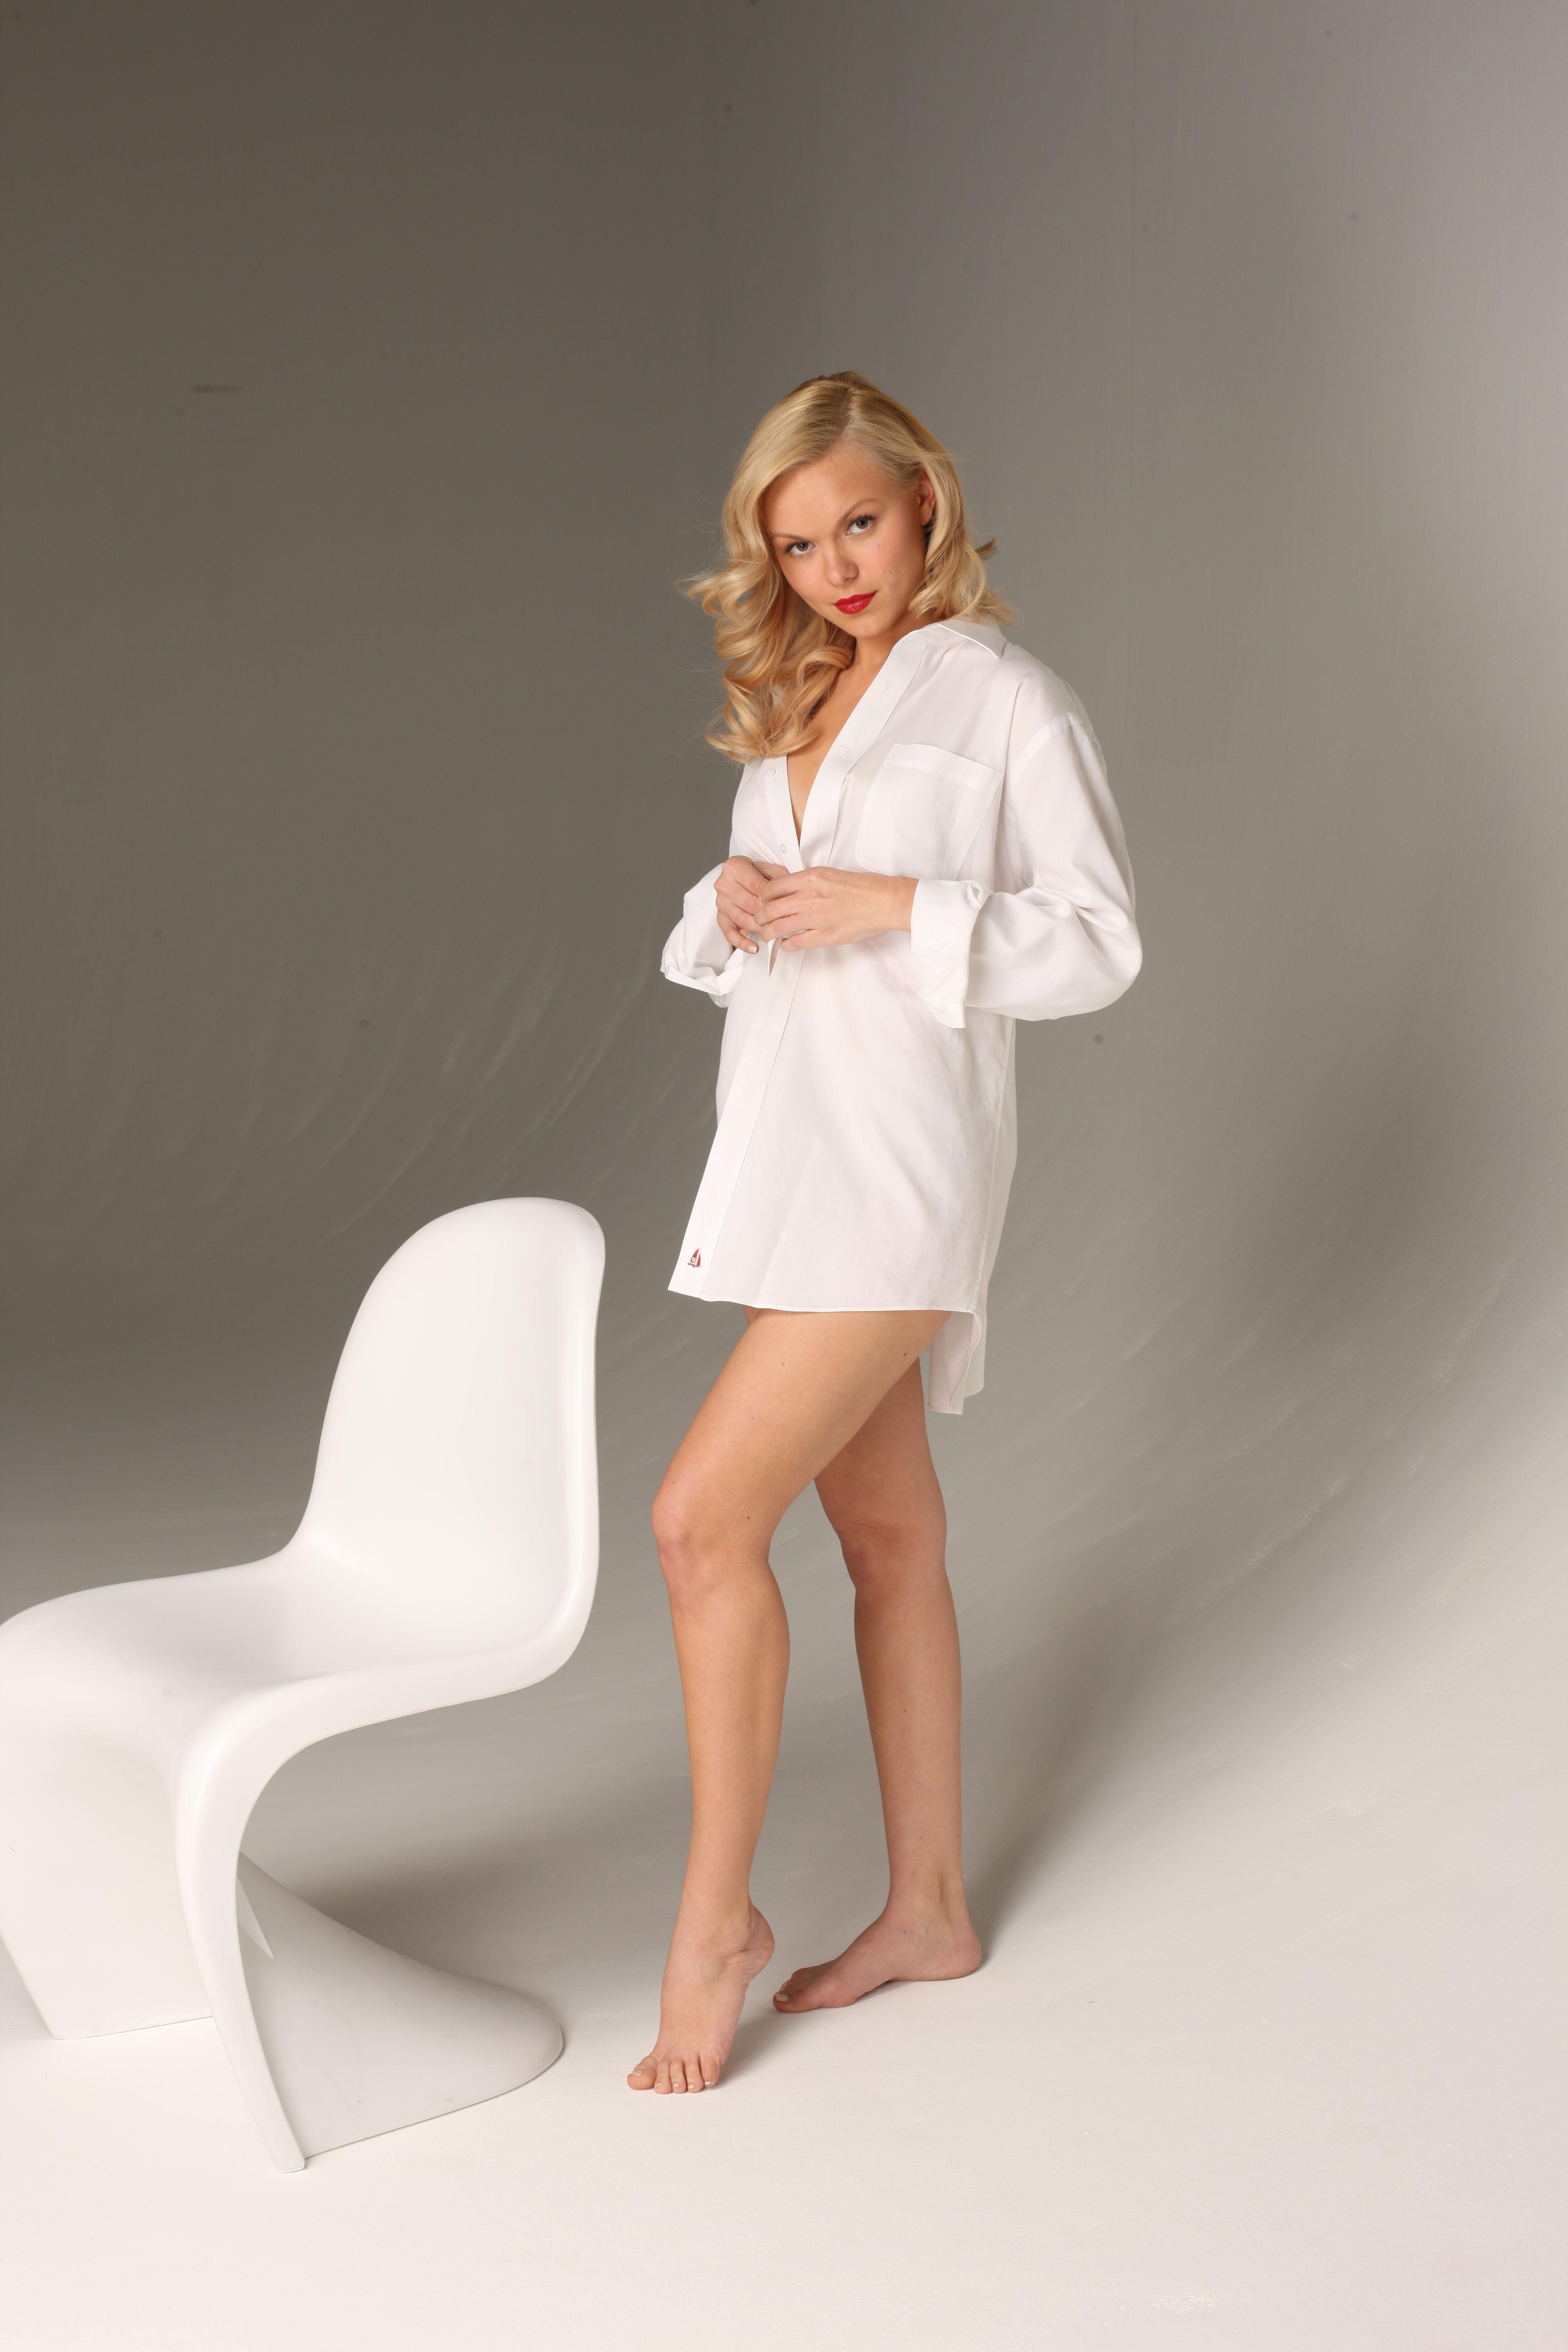 Sideboobs Feet Anya Monzikova  nude (23 fotos), Instagram, braless